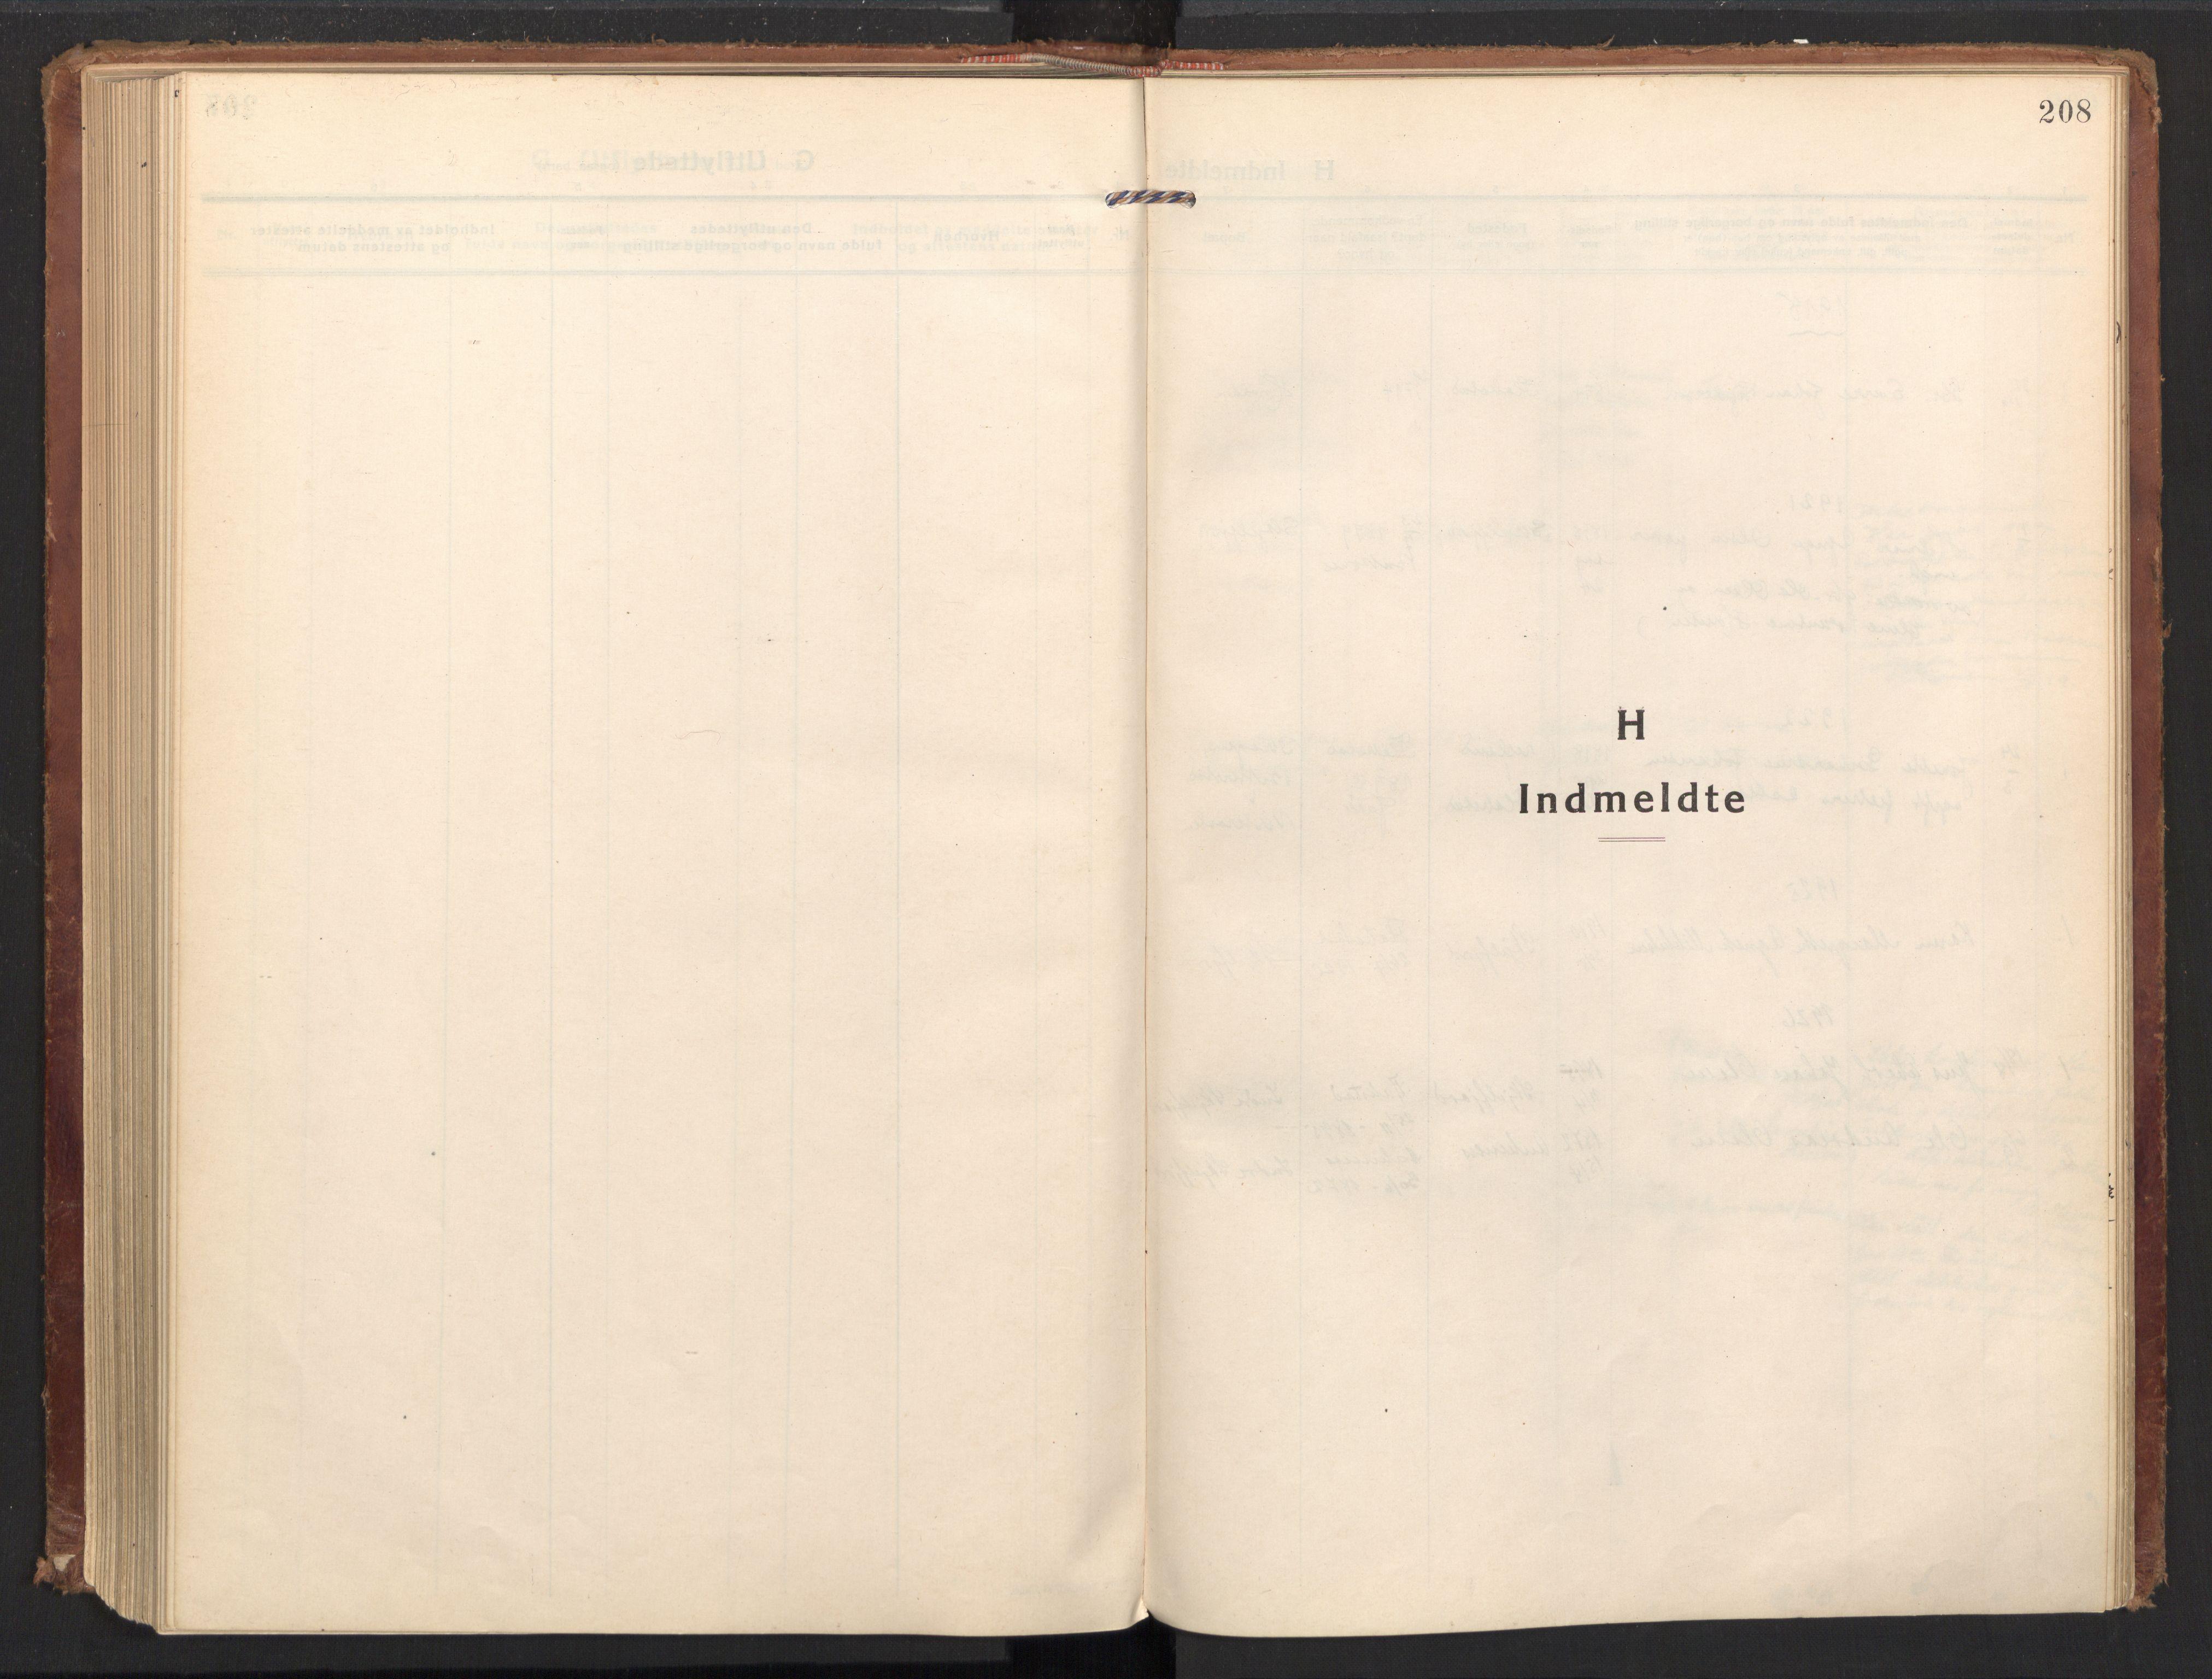 SAT, Ministerialprotokoller, klokkerbøker og fødselsregistre - Nordland, 885/L1210: Ministerialbok nr. 885A10, 1916-1926, s. 208